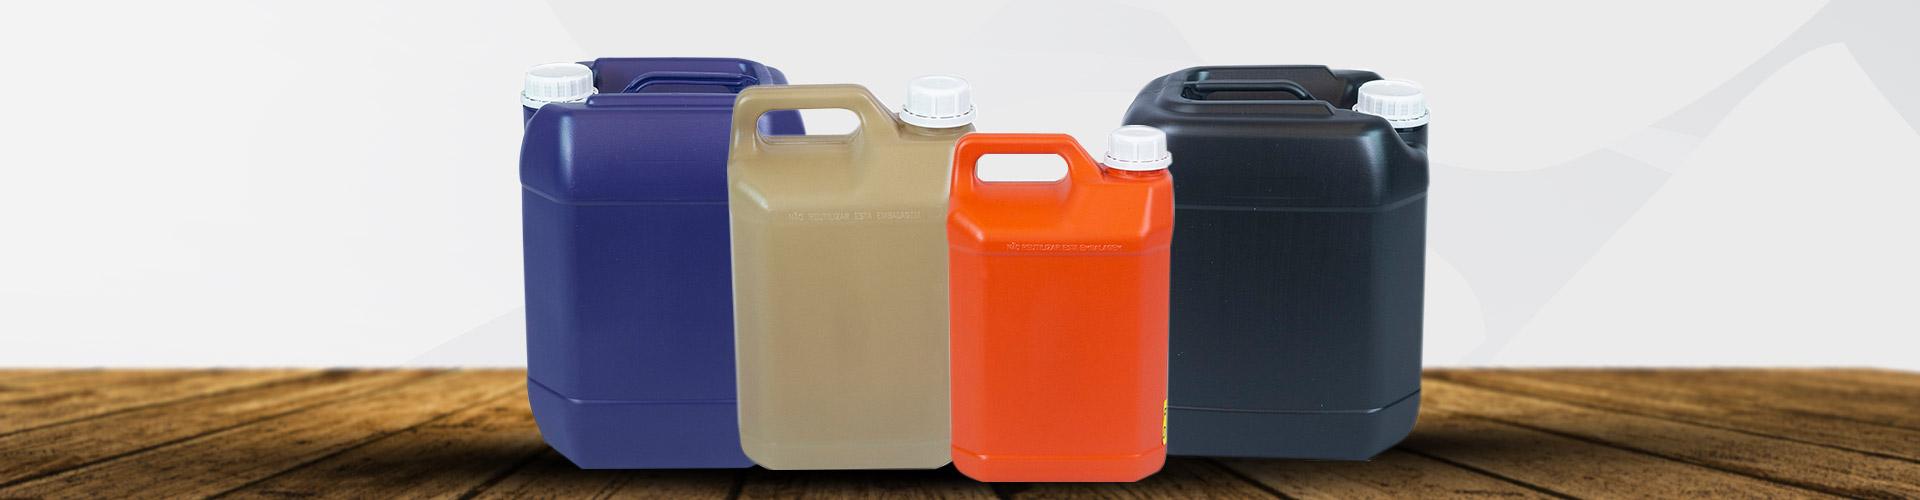 Fabricante de Embalagens para Químicos e Agroquímicos